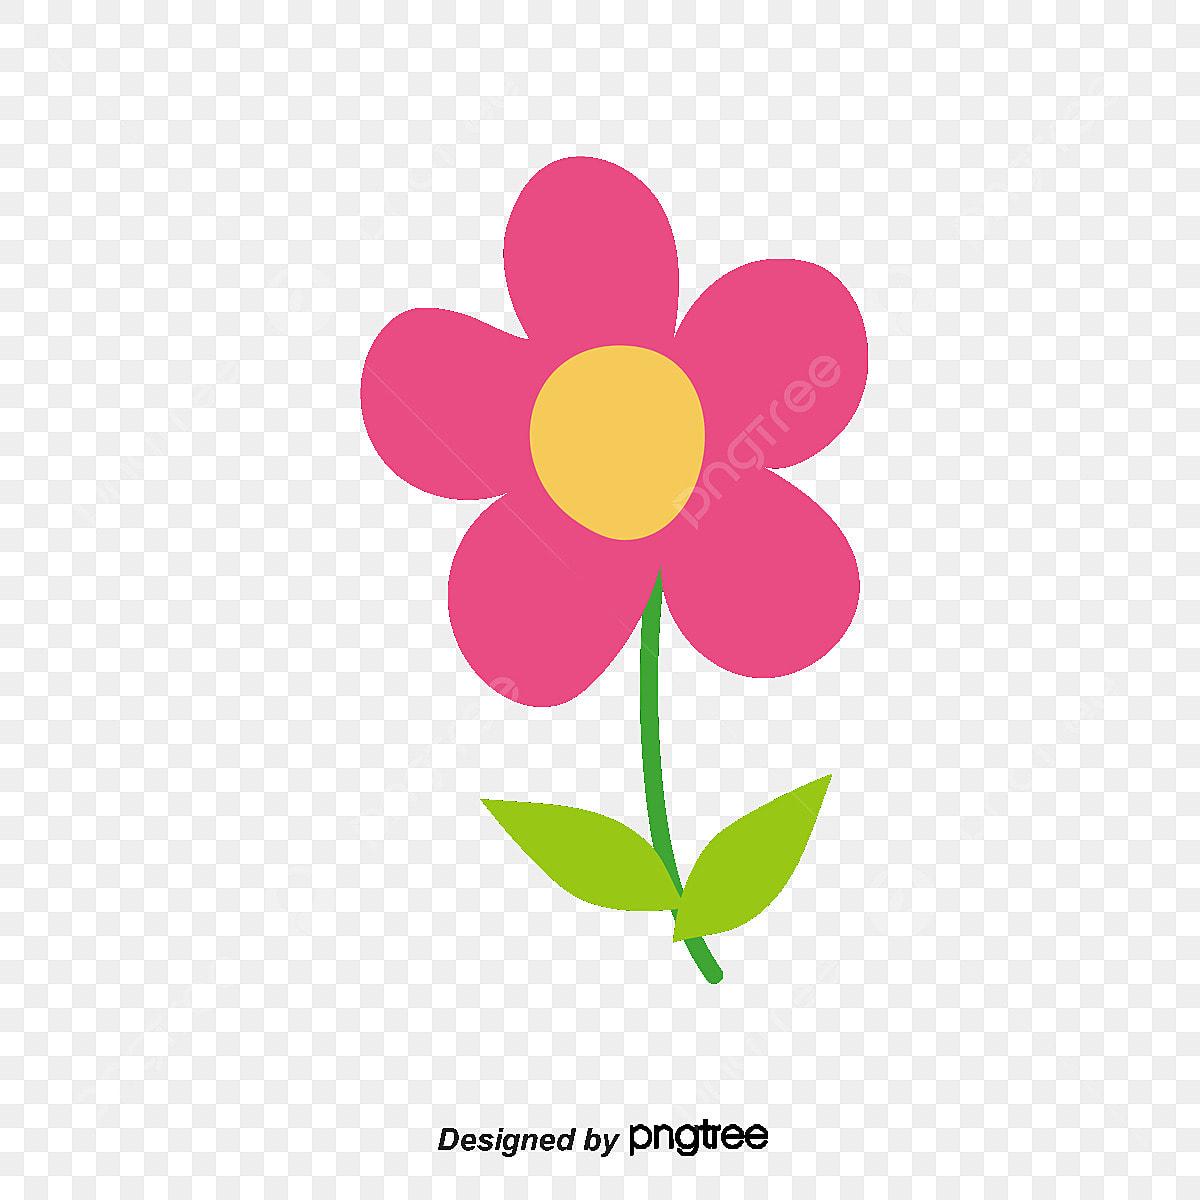 Desenho Infantil Png Images Vetores E Arquivos Psd Download